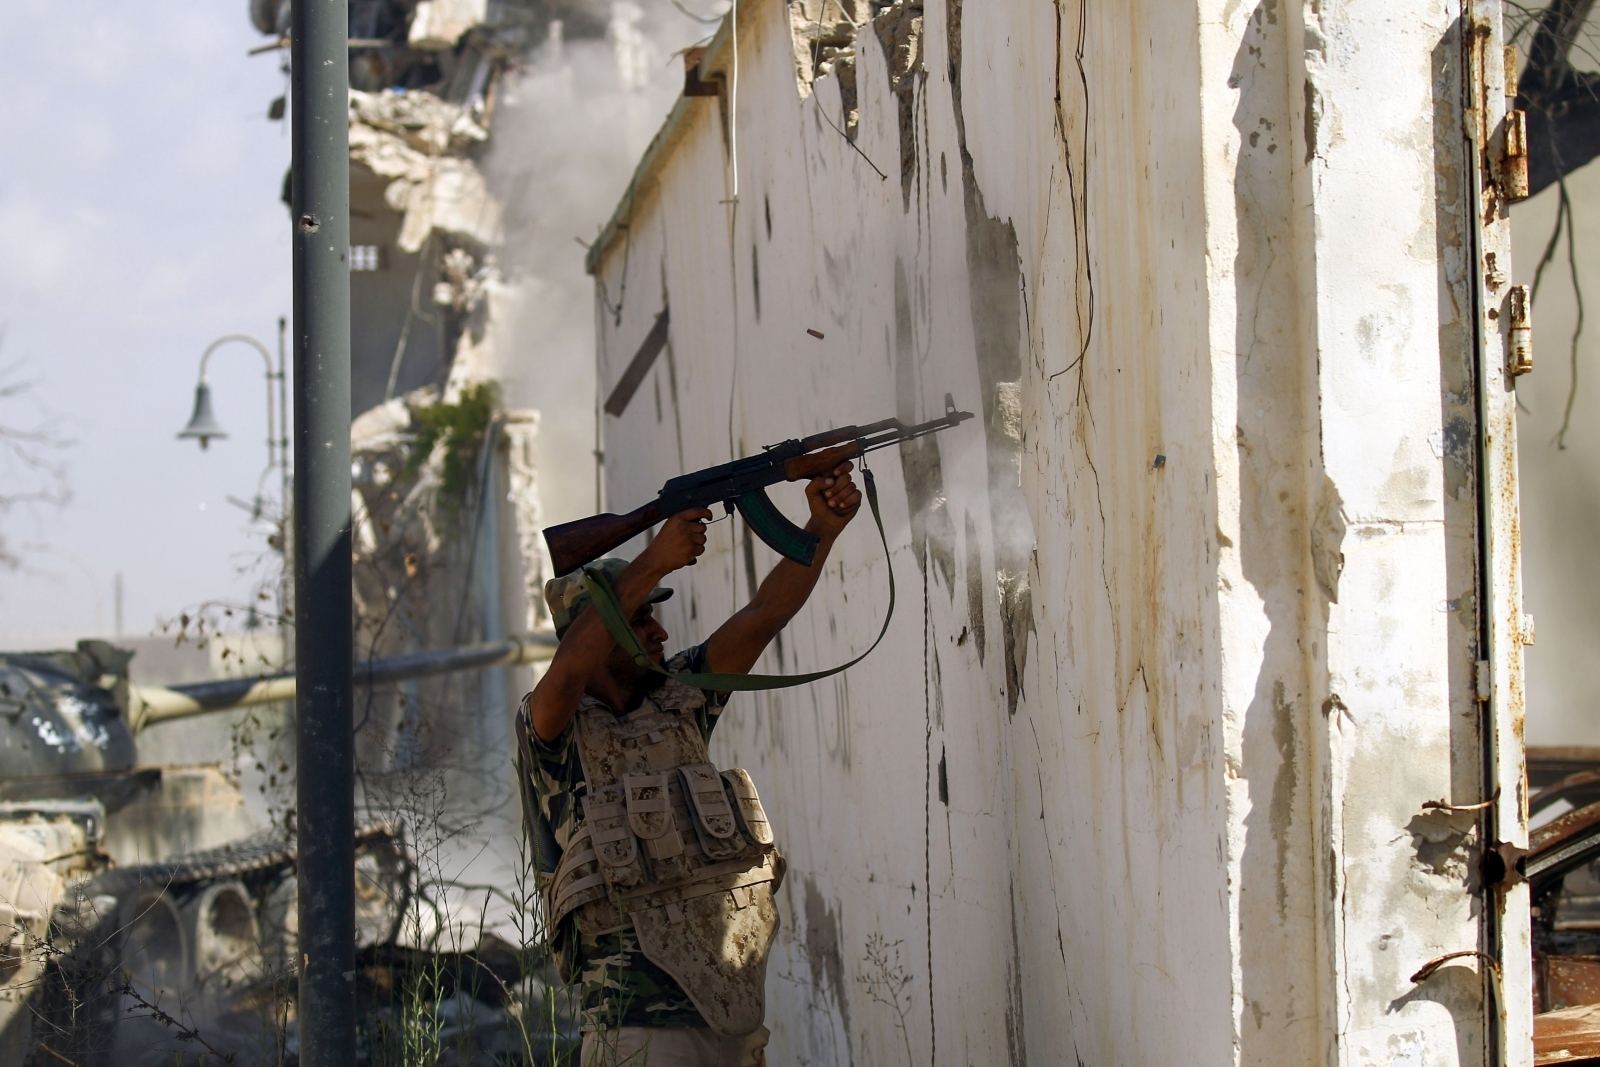 Libyan national army member in Benghazi